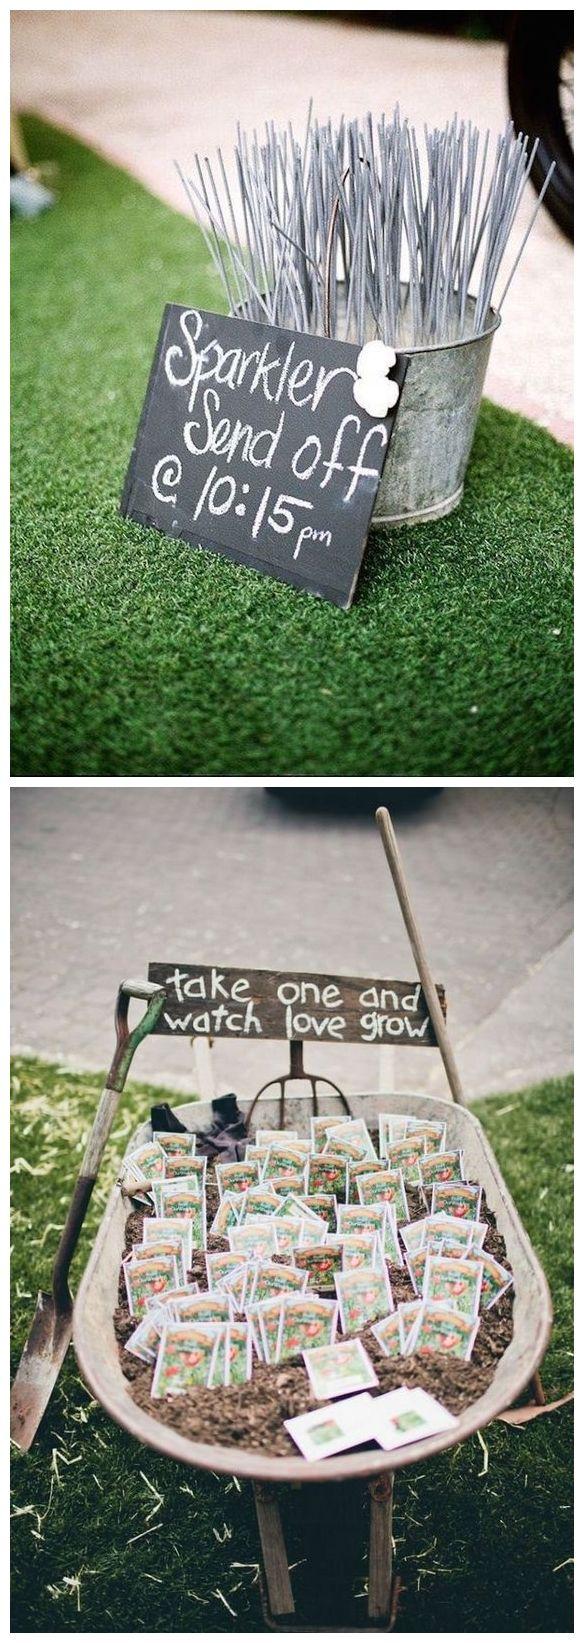 Outdoor Backyard Garden Wedding Ideas #weddings #weddingideas #weddinginspiration